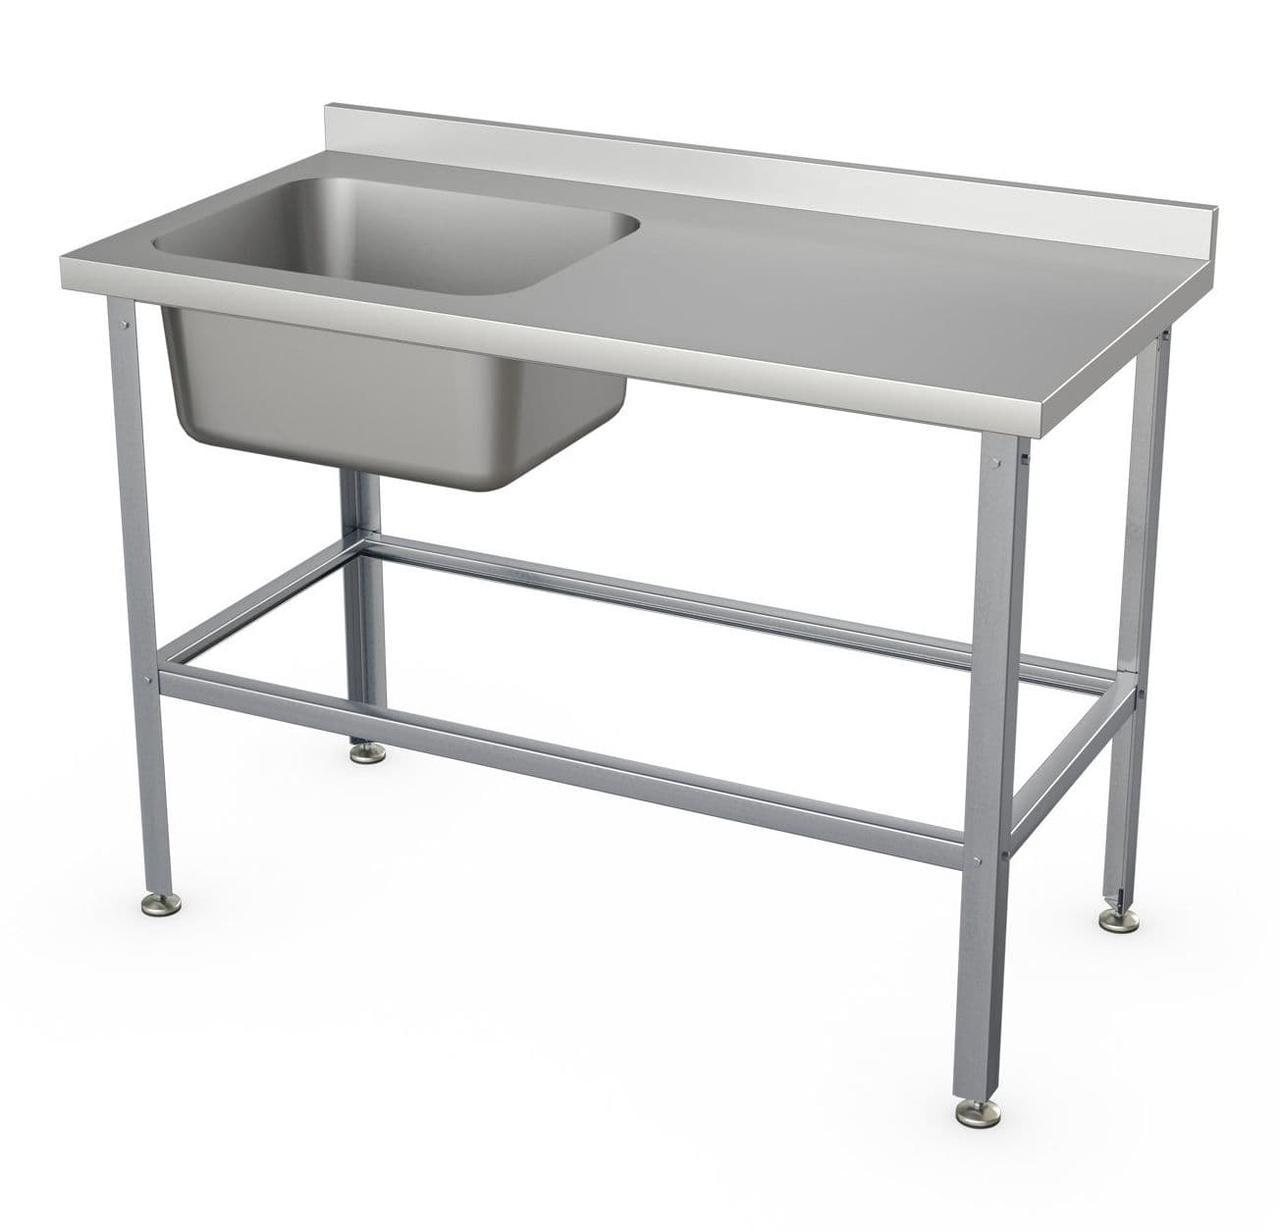 Ванна моечная Atesy ВСМЦС-С-1Л.500.400-1200.600-1-02